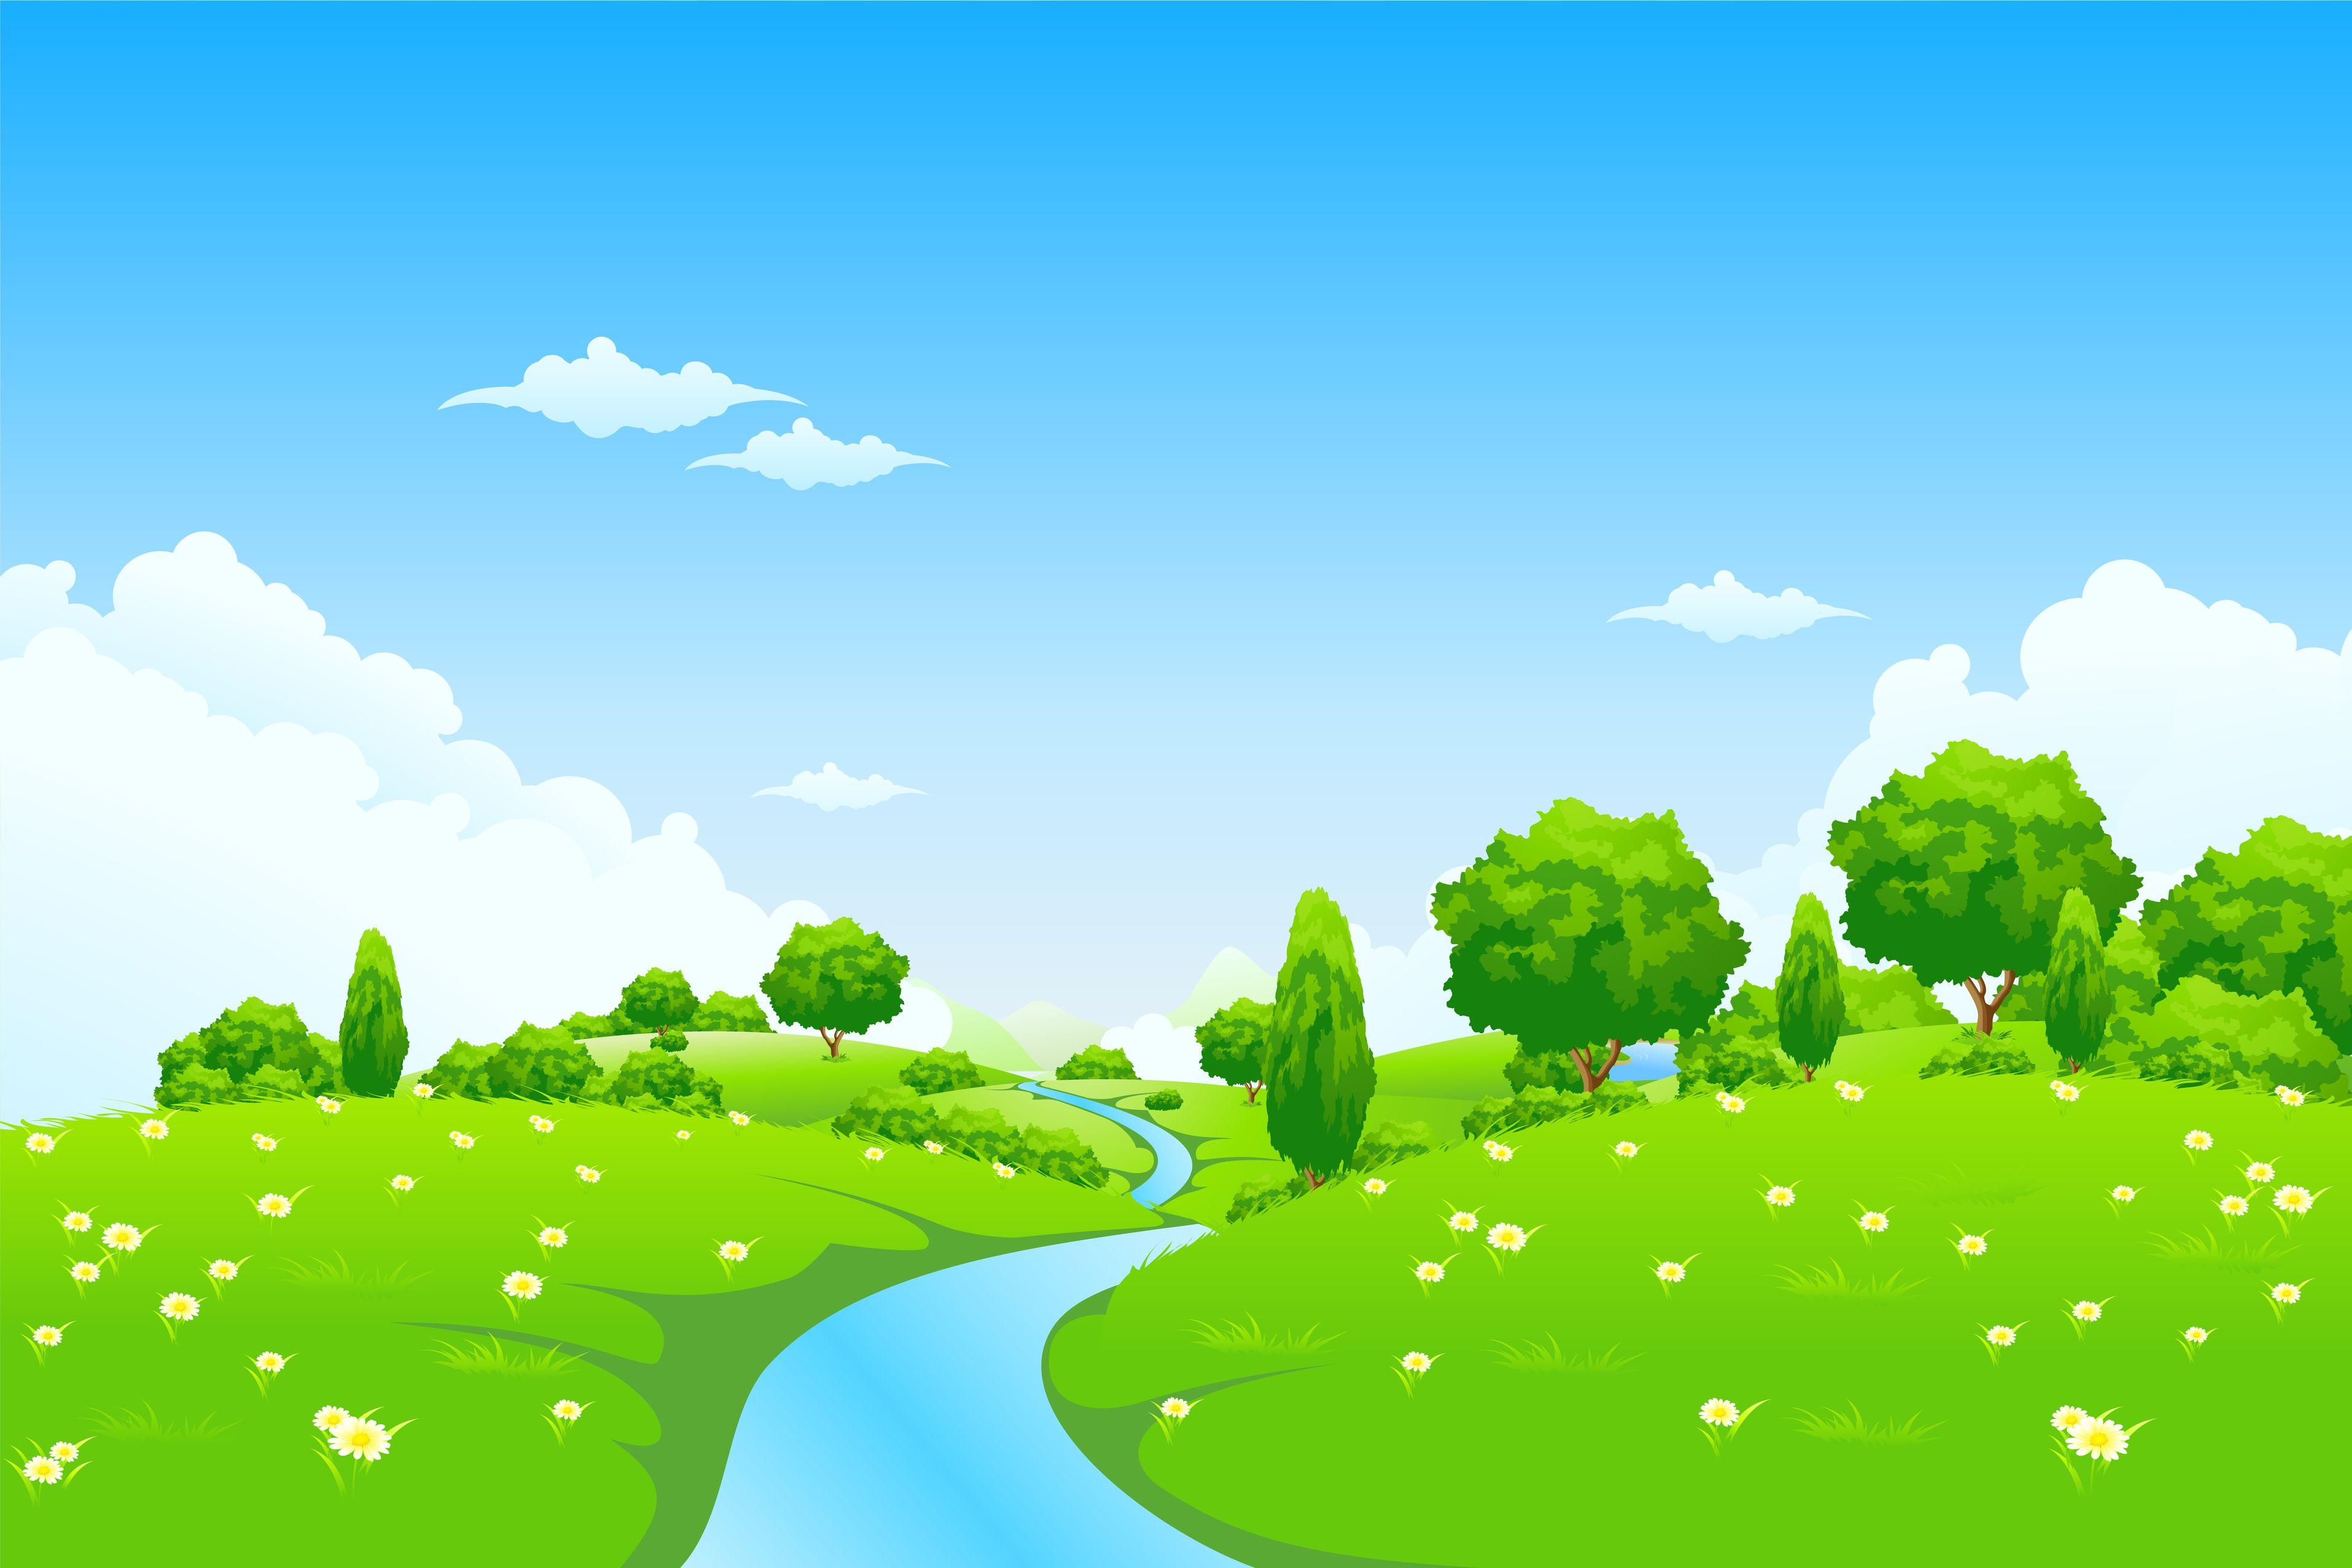 River Clip Art Images .-River Clip Art Images .-11